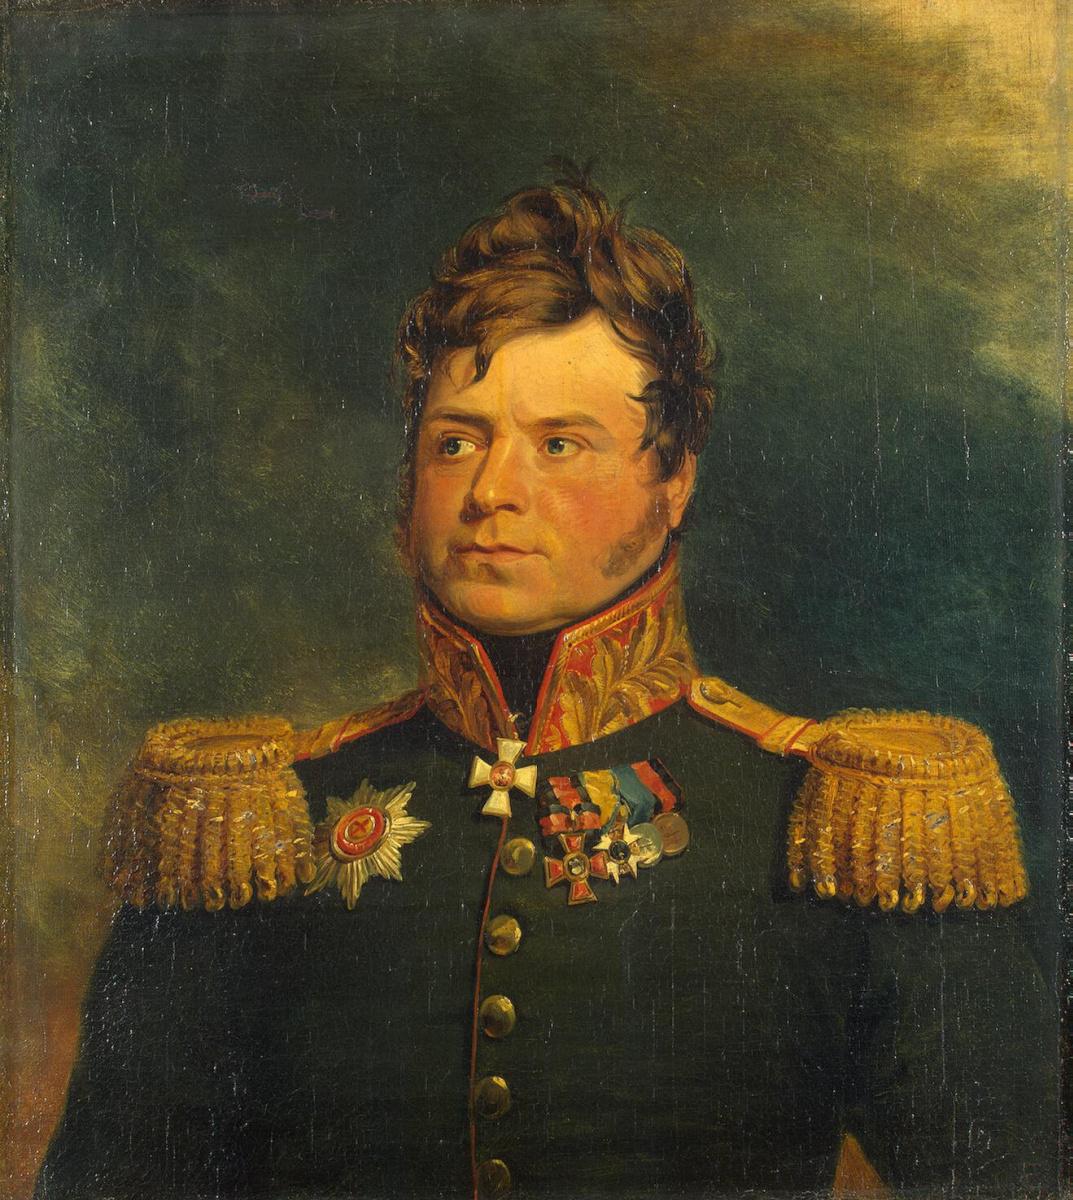 Джордж Доу. Портрет Александра Карловича Ридингера